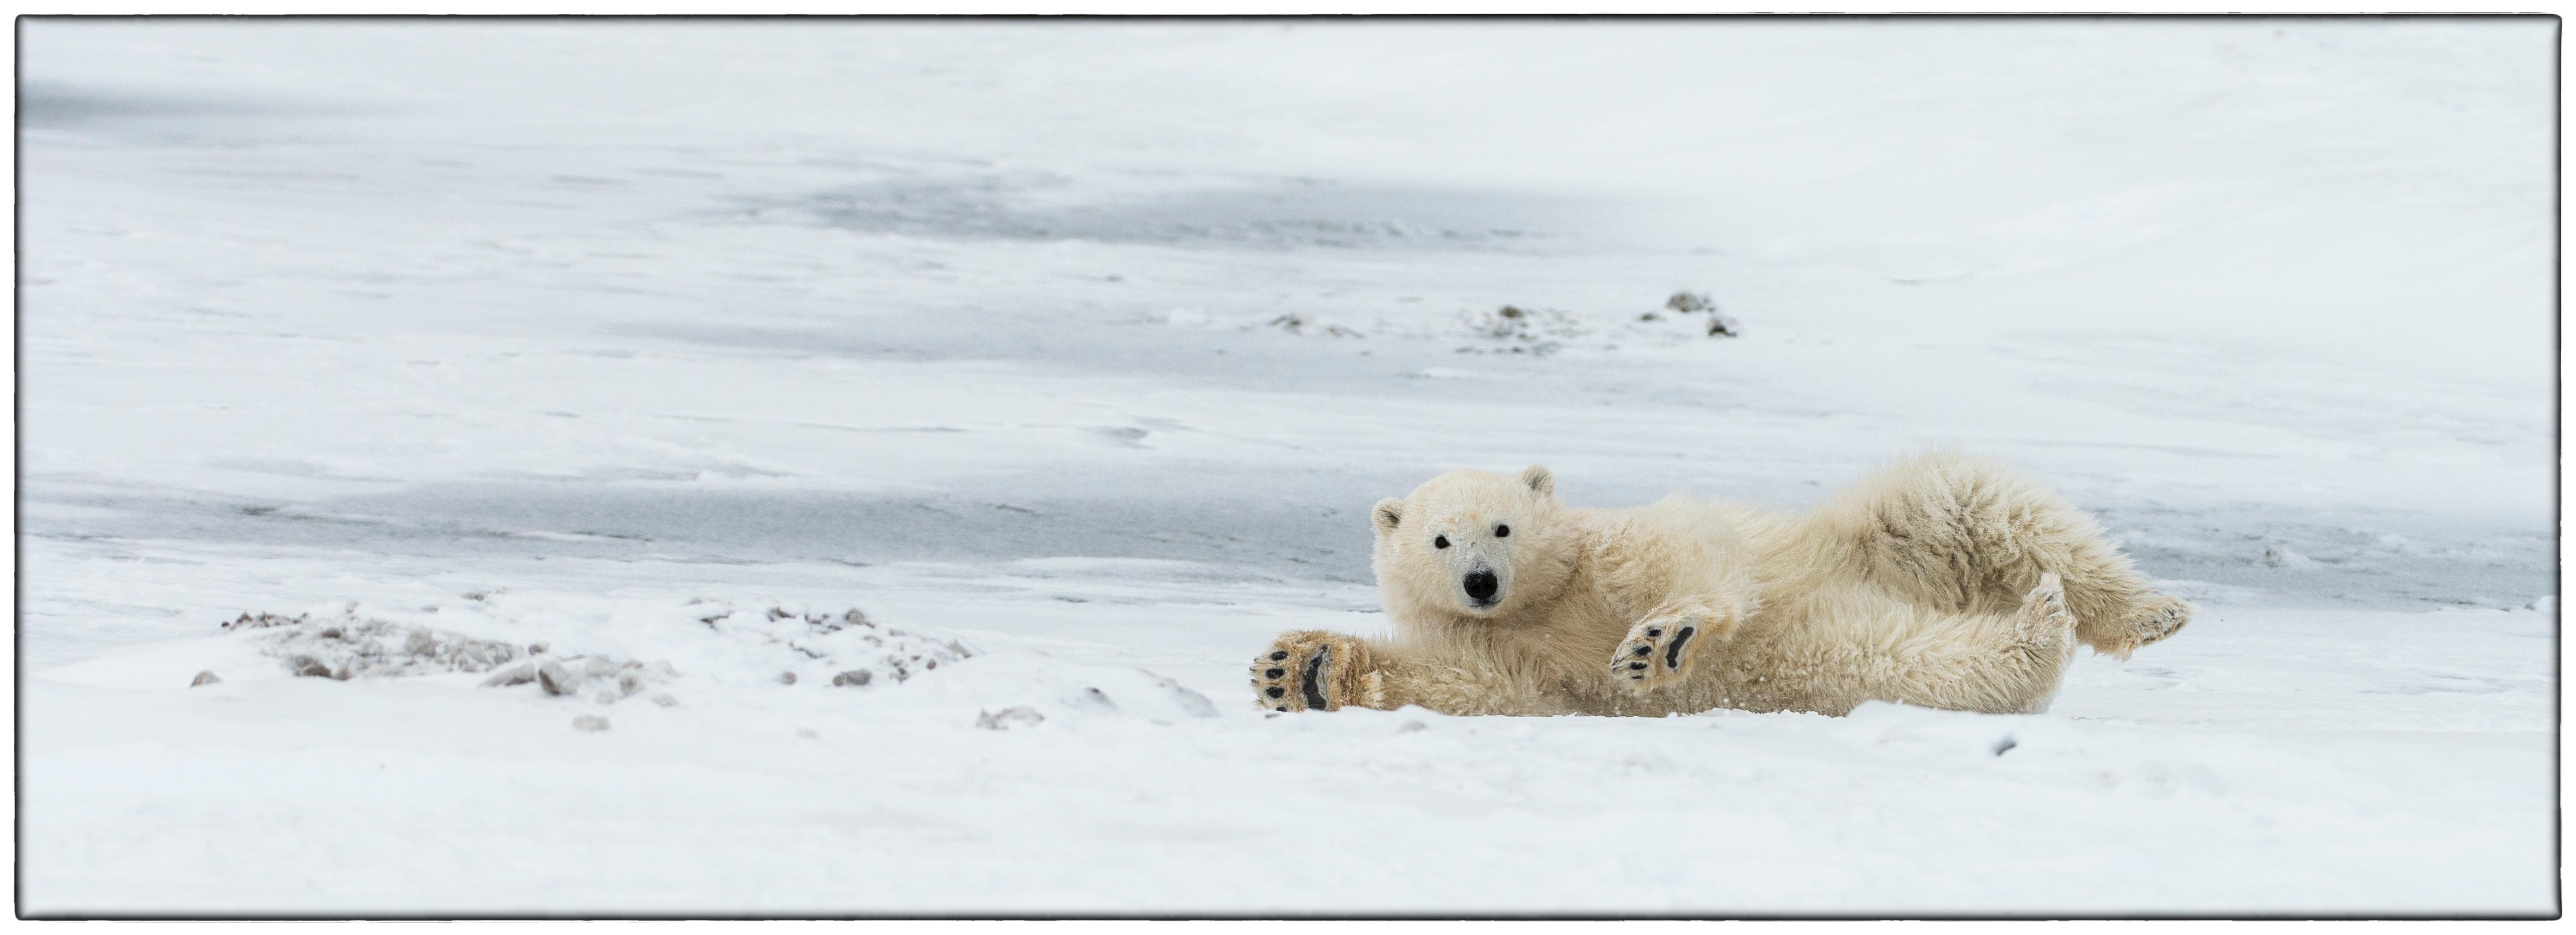 Cub Rolling in snow